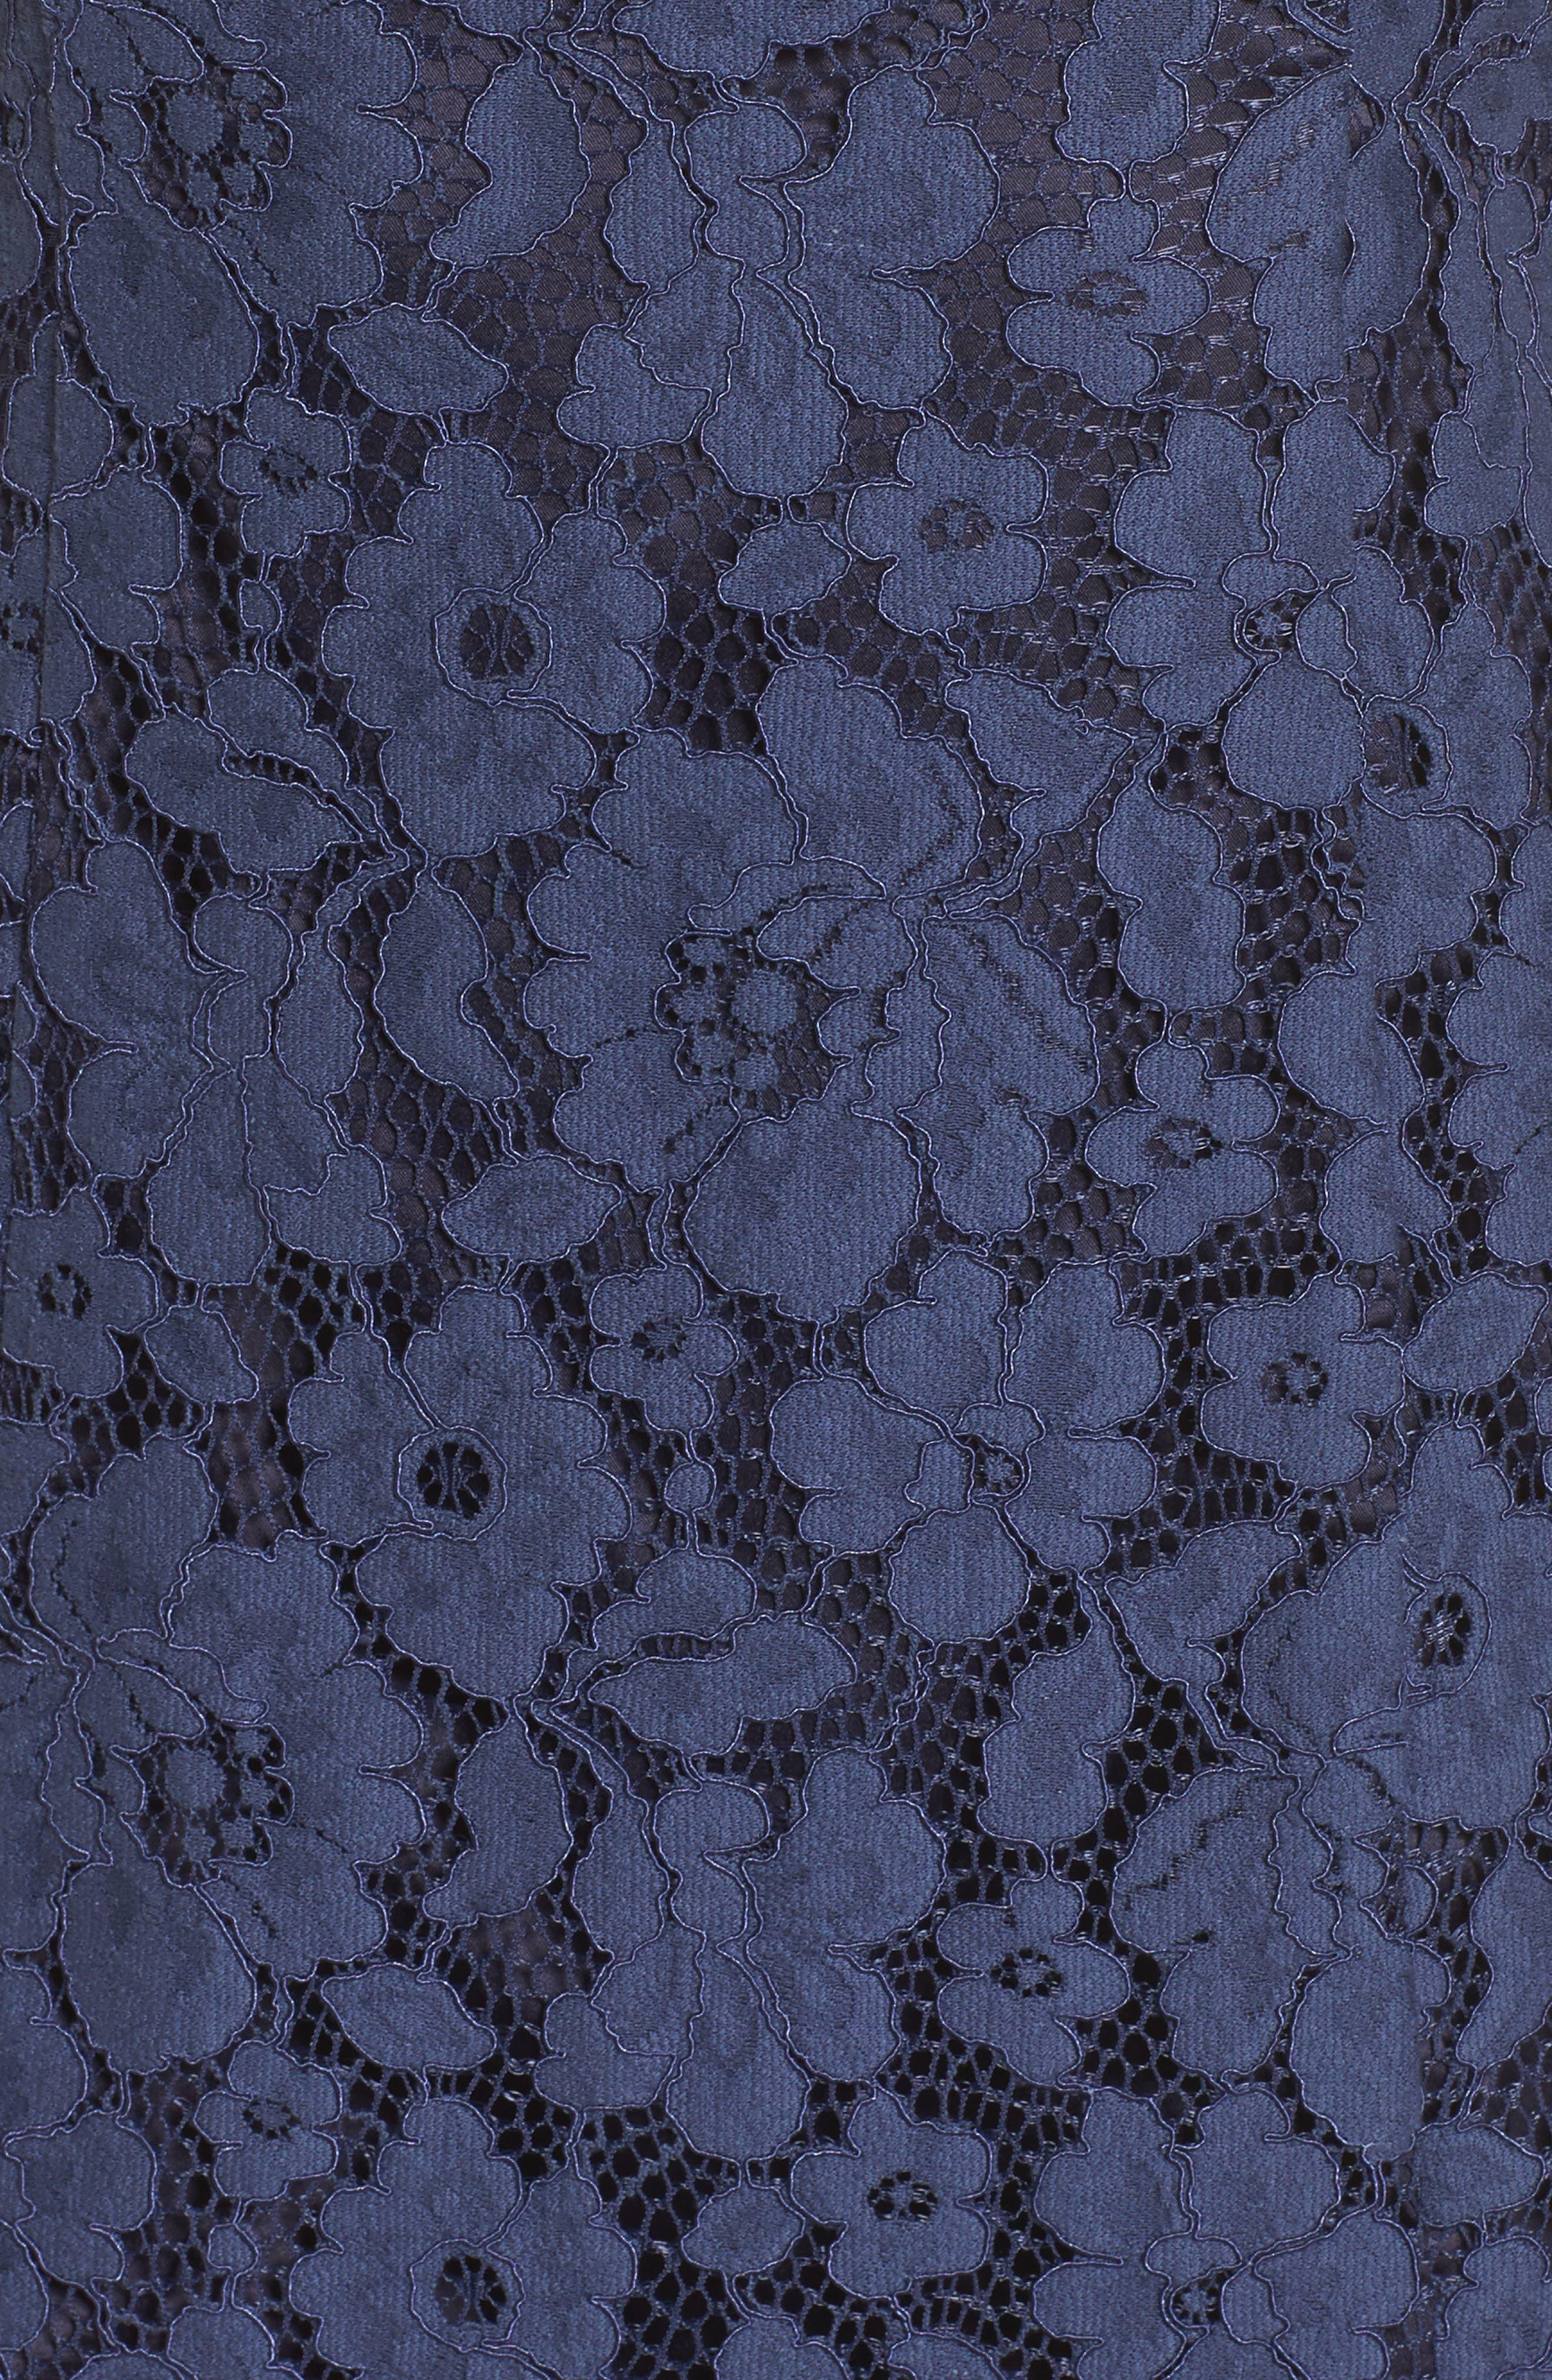 Ruffle Lace Sheath Dress,                             Alternate thumbnail 5, color,                             410